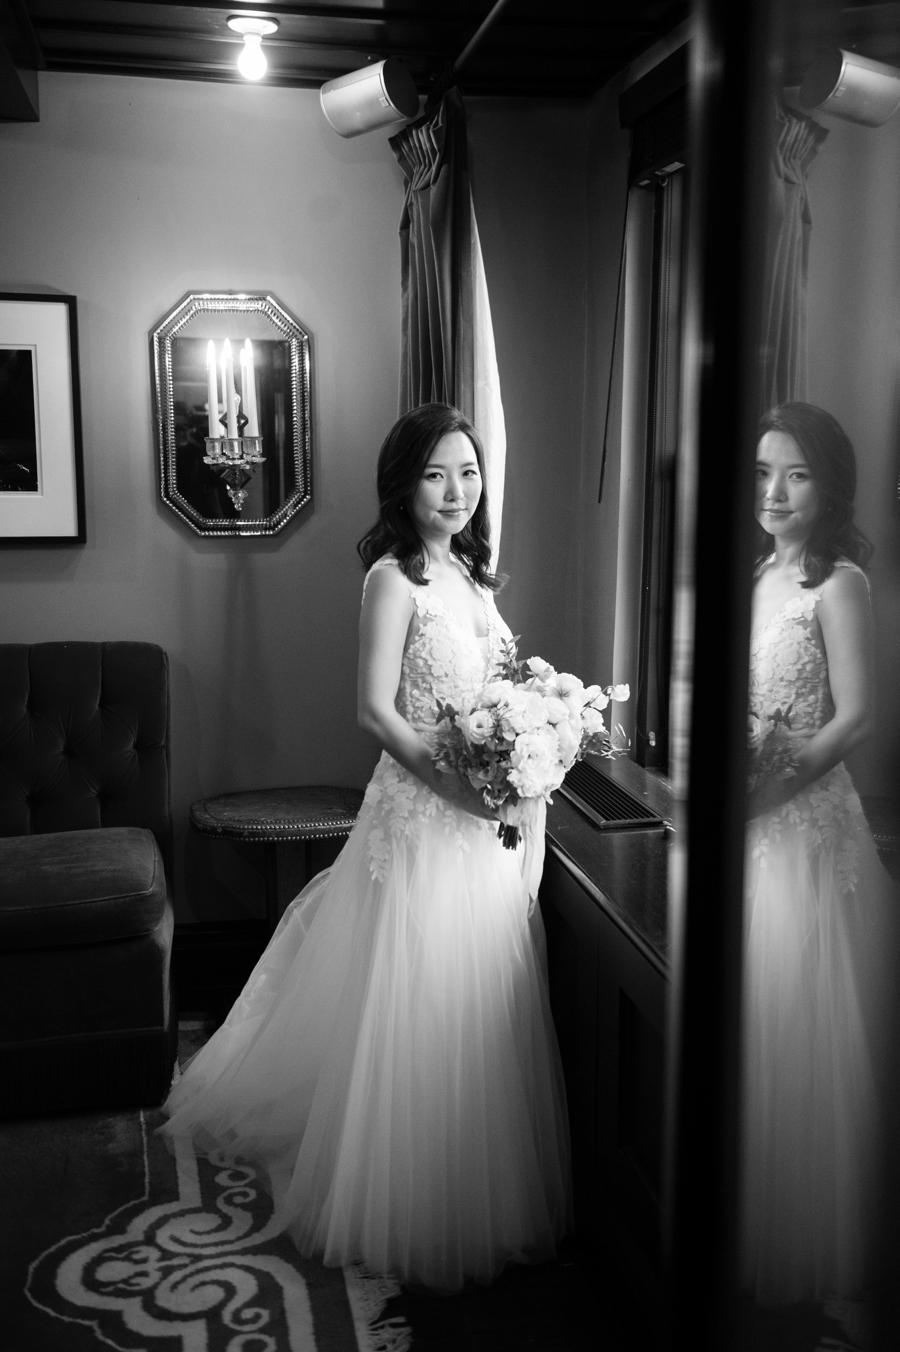 Gramercy_Park_Hotel_NYC_Wedding_AG_019.jpg